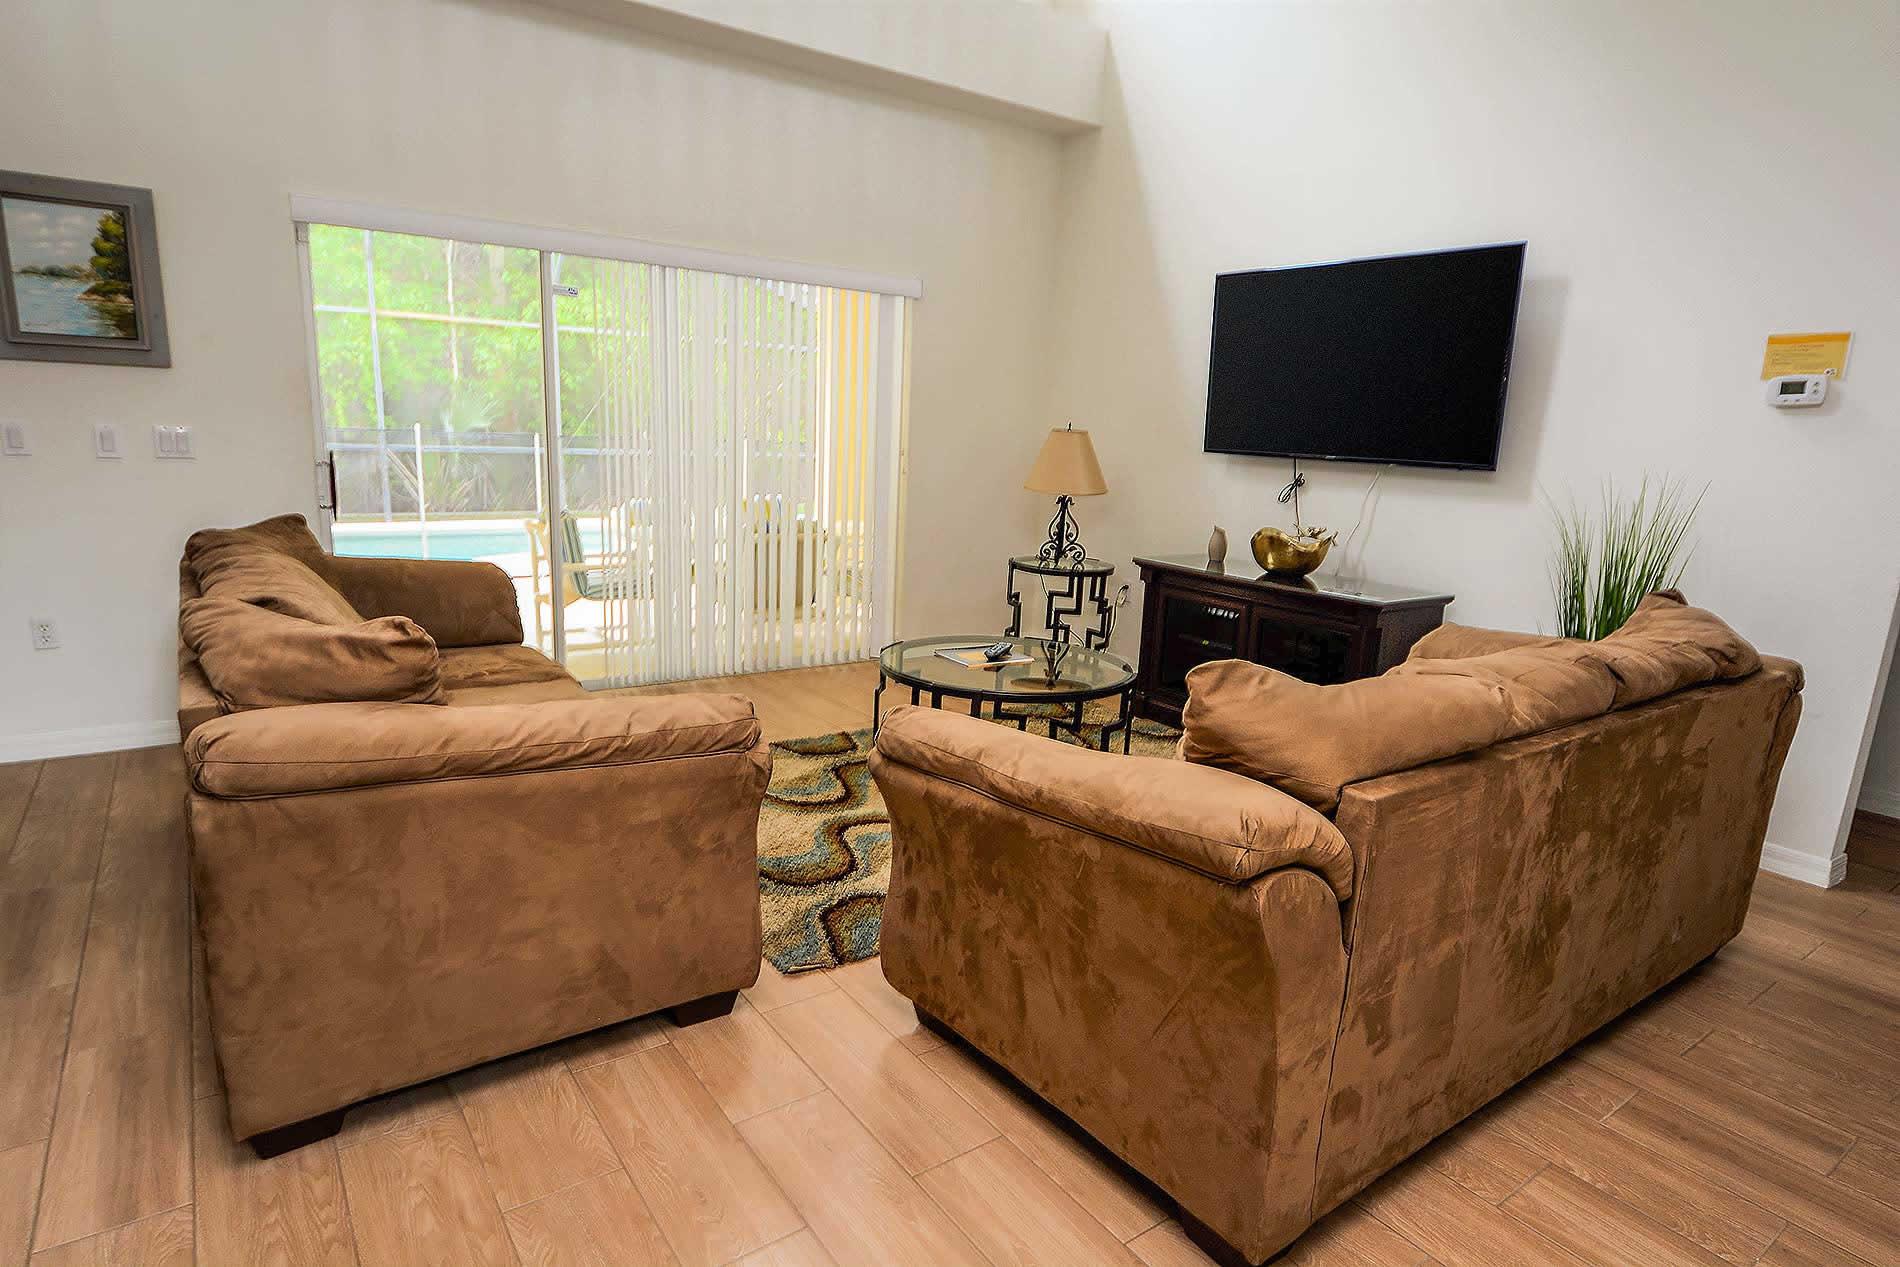 Villa Eagle in Disney Area and Kissimmee - sleeps 12 people